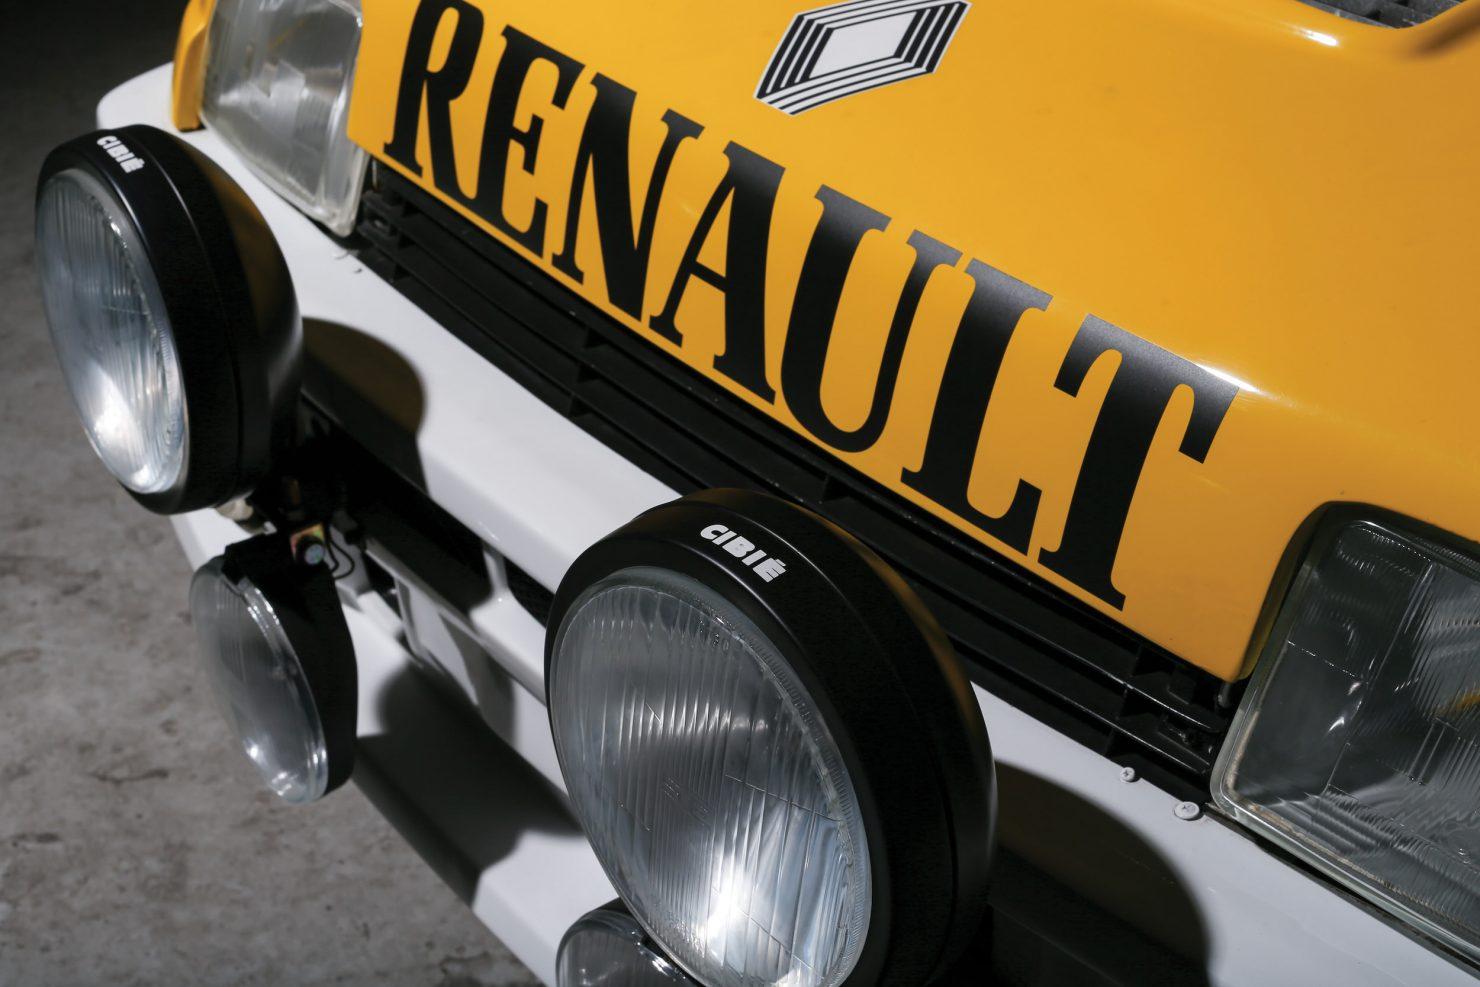 Renault 5 Turbo 5 1480x987 - 1980 Renault 5 Turbo